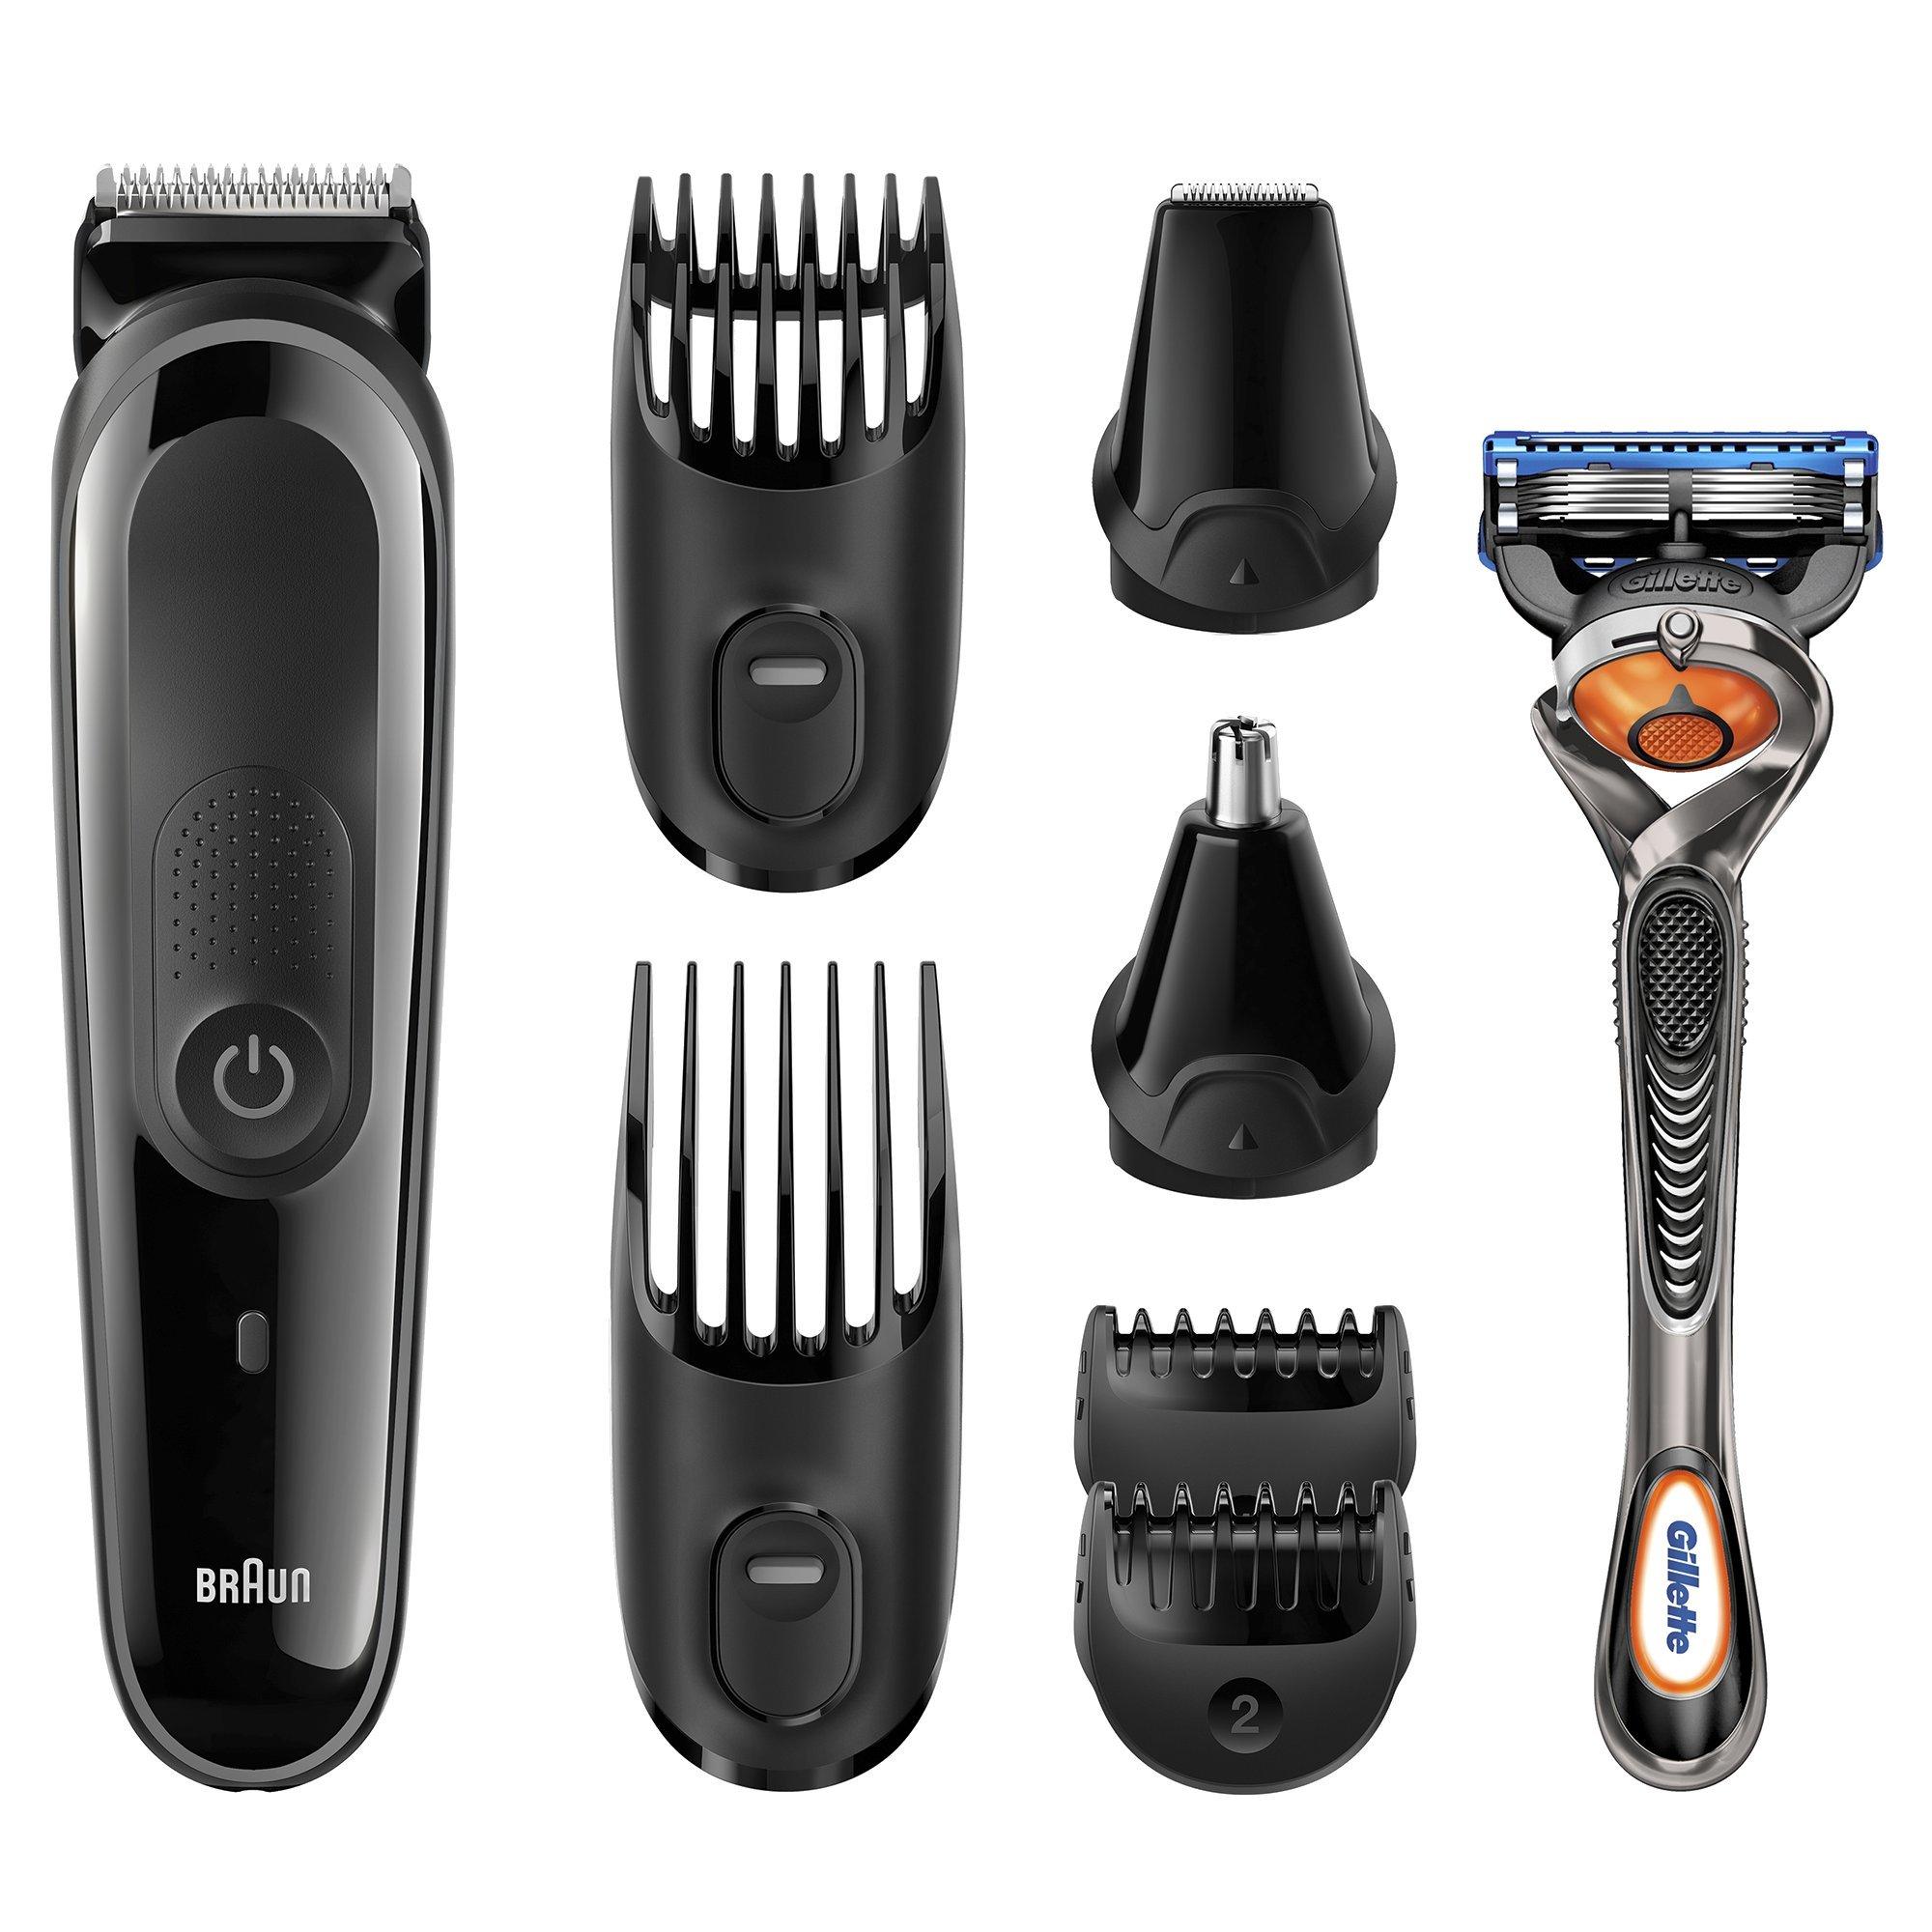 braun mgk3060 grooming kit 8 in one beard hair trimming kit fusion proglide ebay. Black Bedroom Furniture Sets. Home Design Ideas